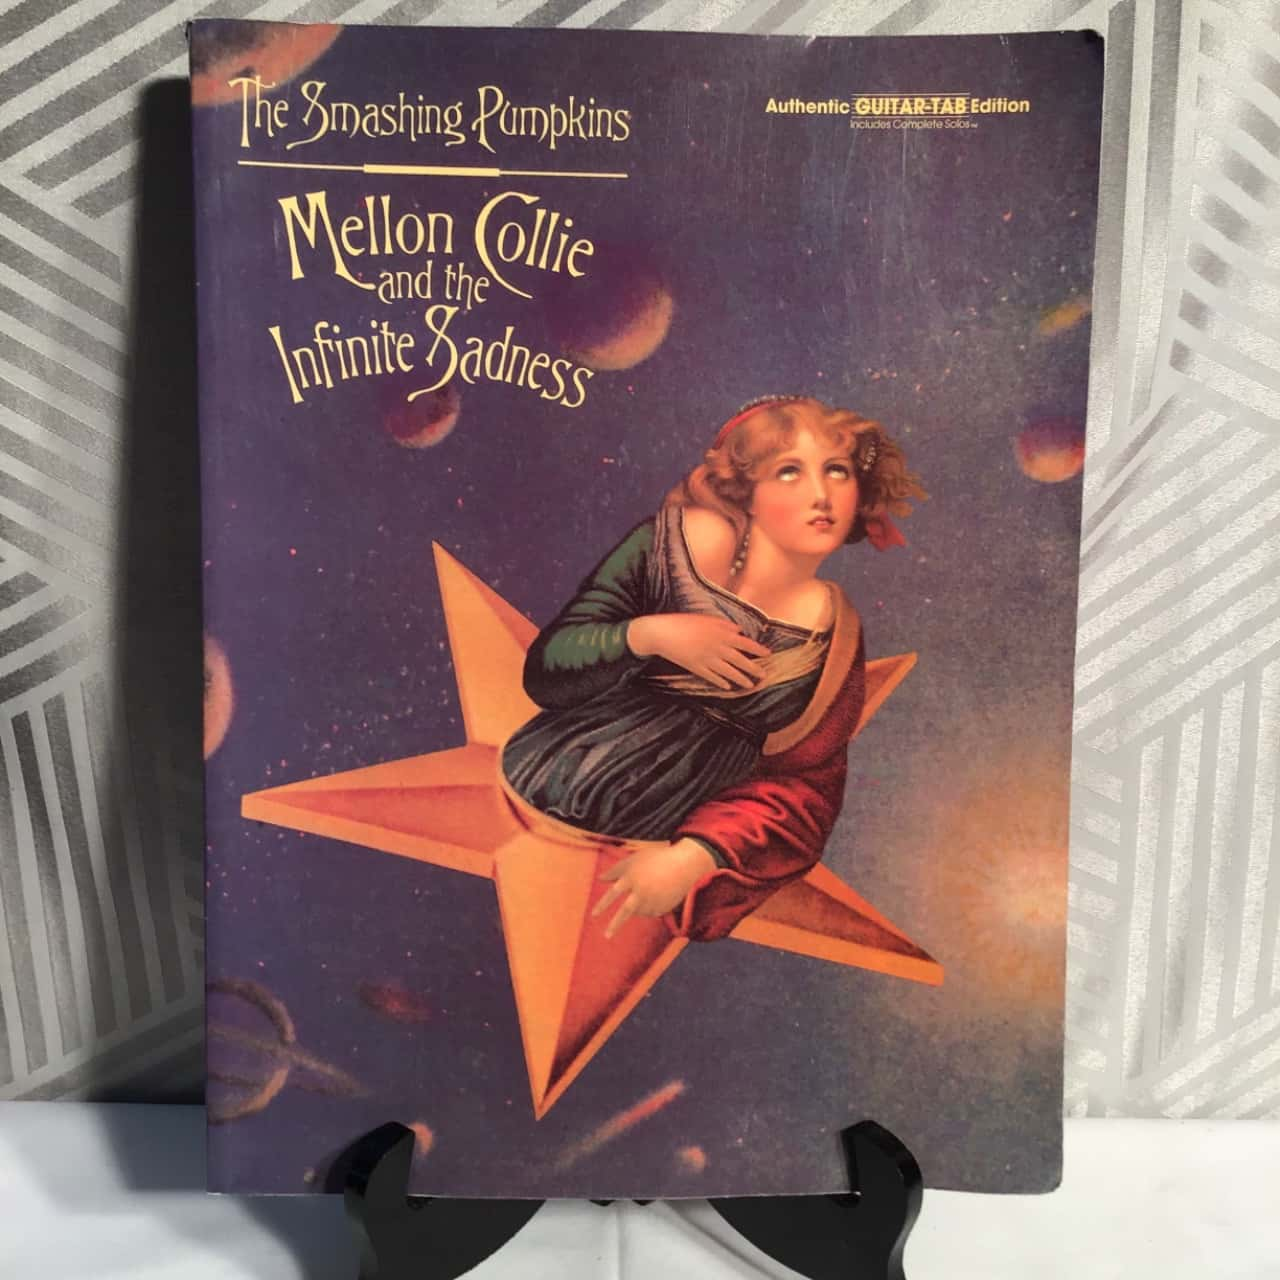 The Smashing Pumpkins Guitar Book